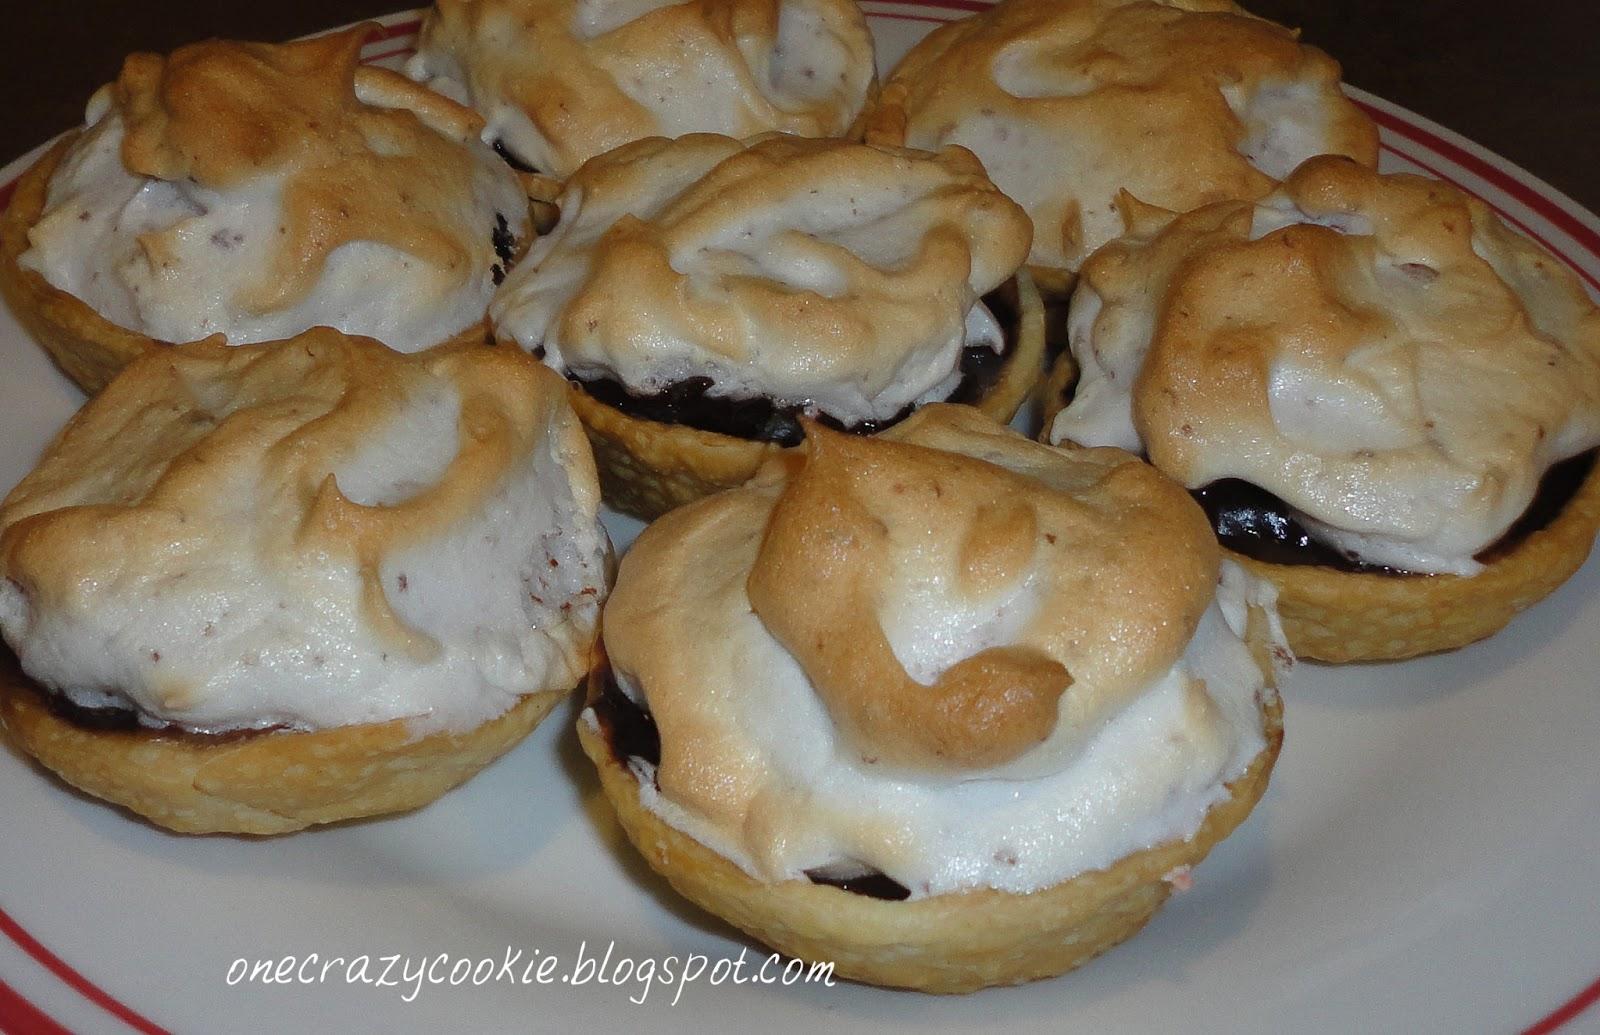 One Crazy Cookie: Mini Chocolate Meringue Pies